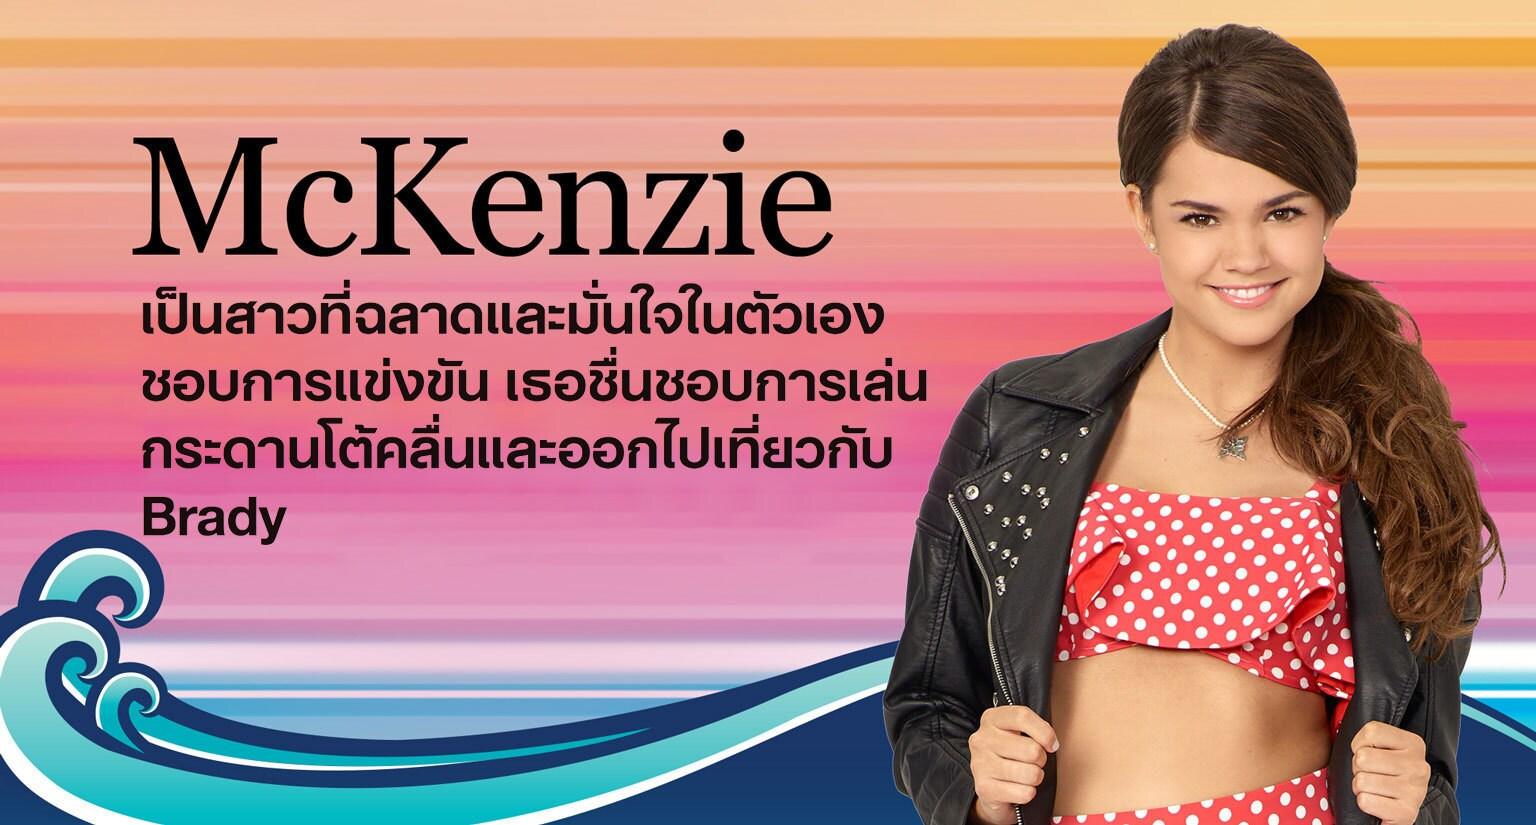 Teen Beach 2 - Show Home - McKenzie Character Hero - TH